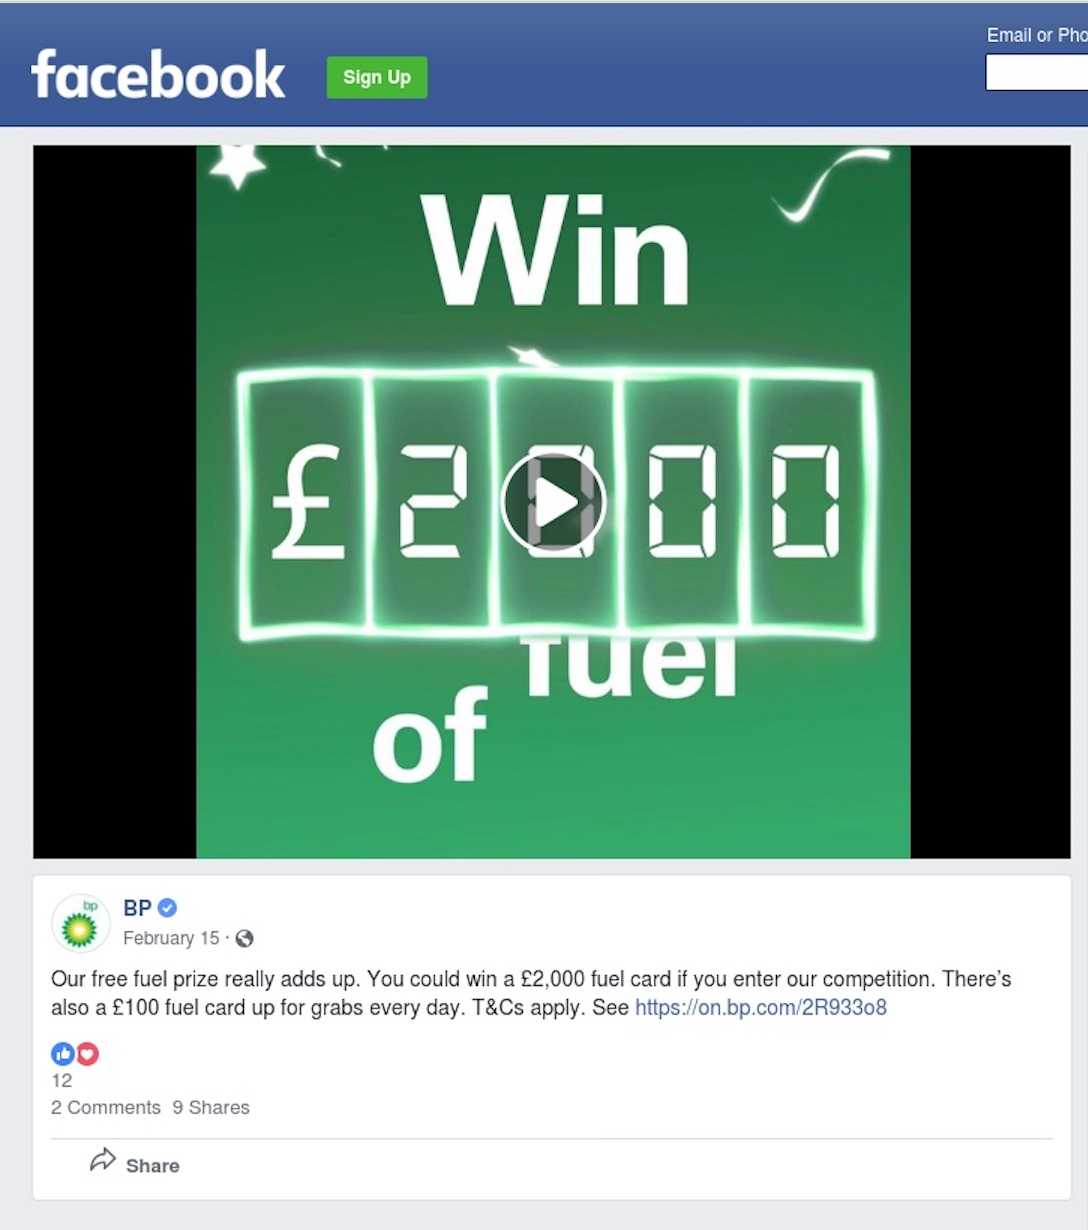 BP fuel your year social post.jpeg